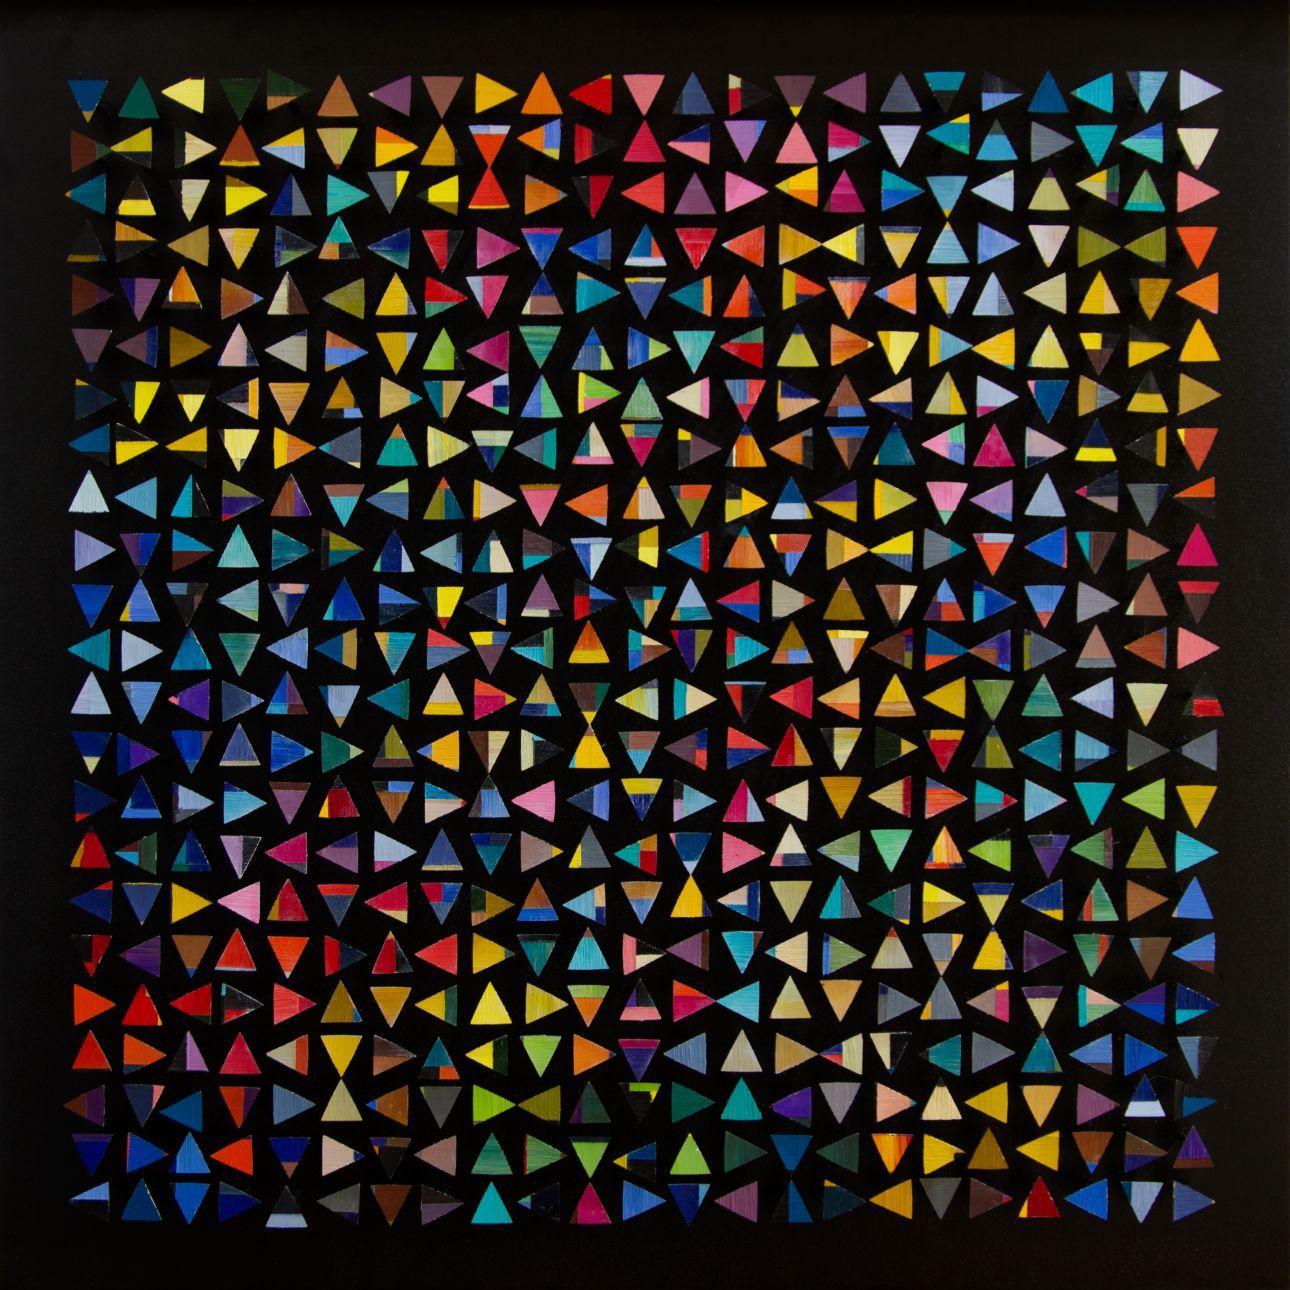 Square Triangle (2020) - Ramón Suau